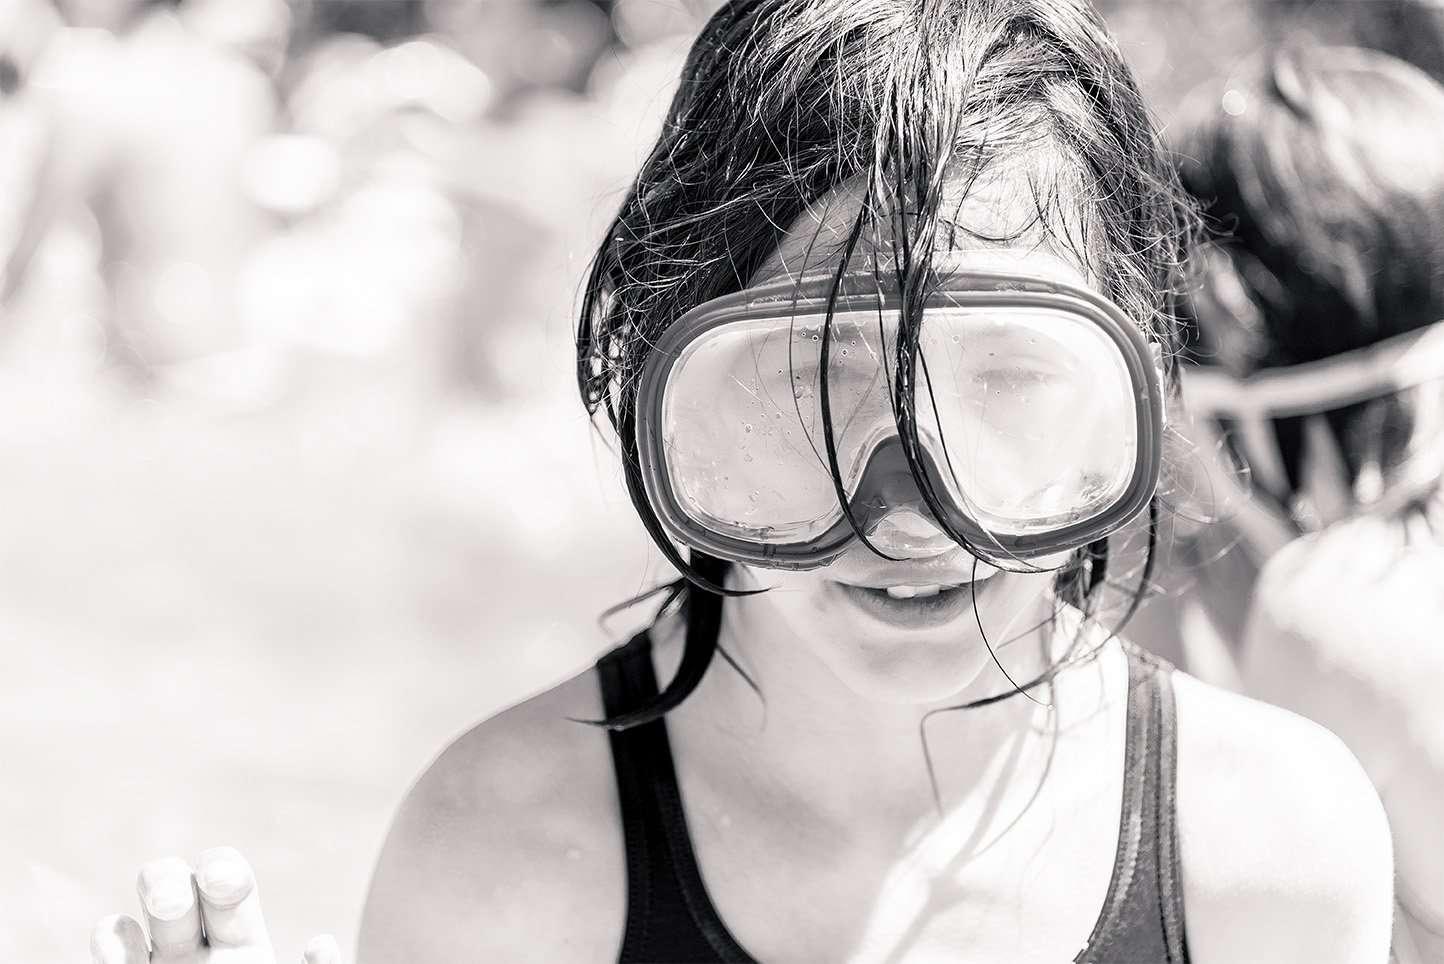 fotografia-streetphotography-autismo-pozzuoli-napoli-gemella